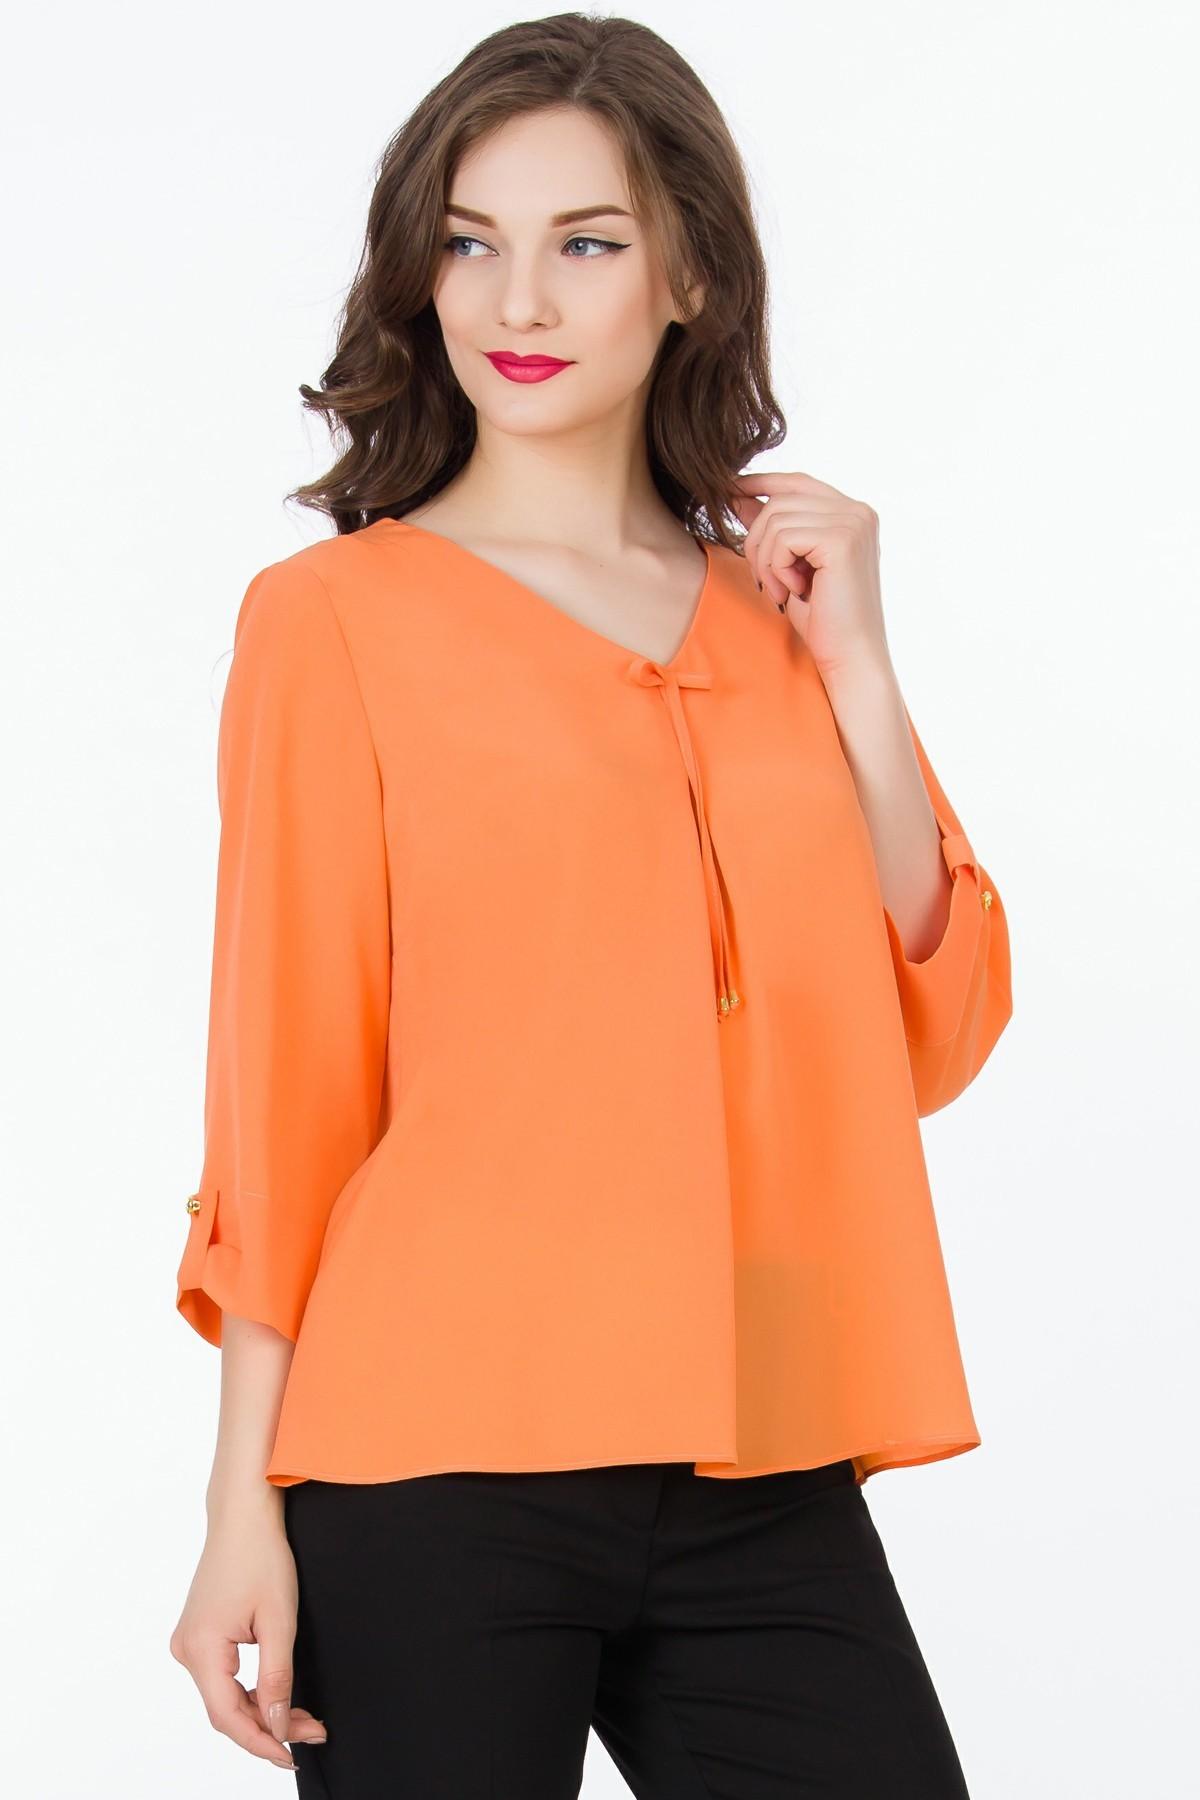 bluza-sense-oranj